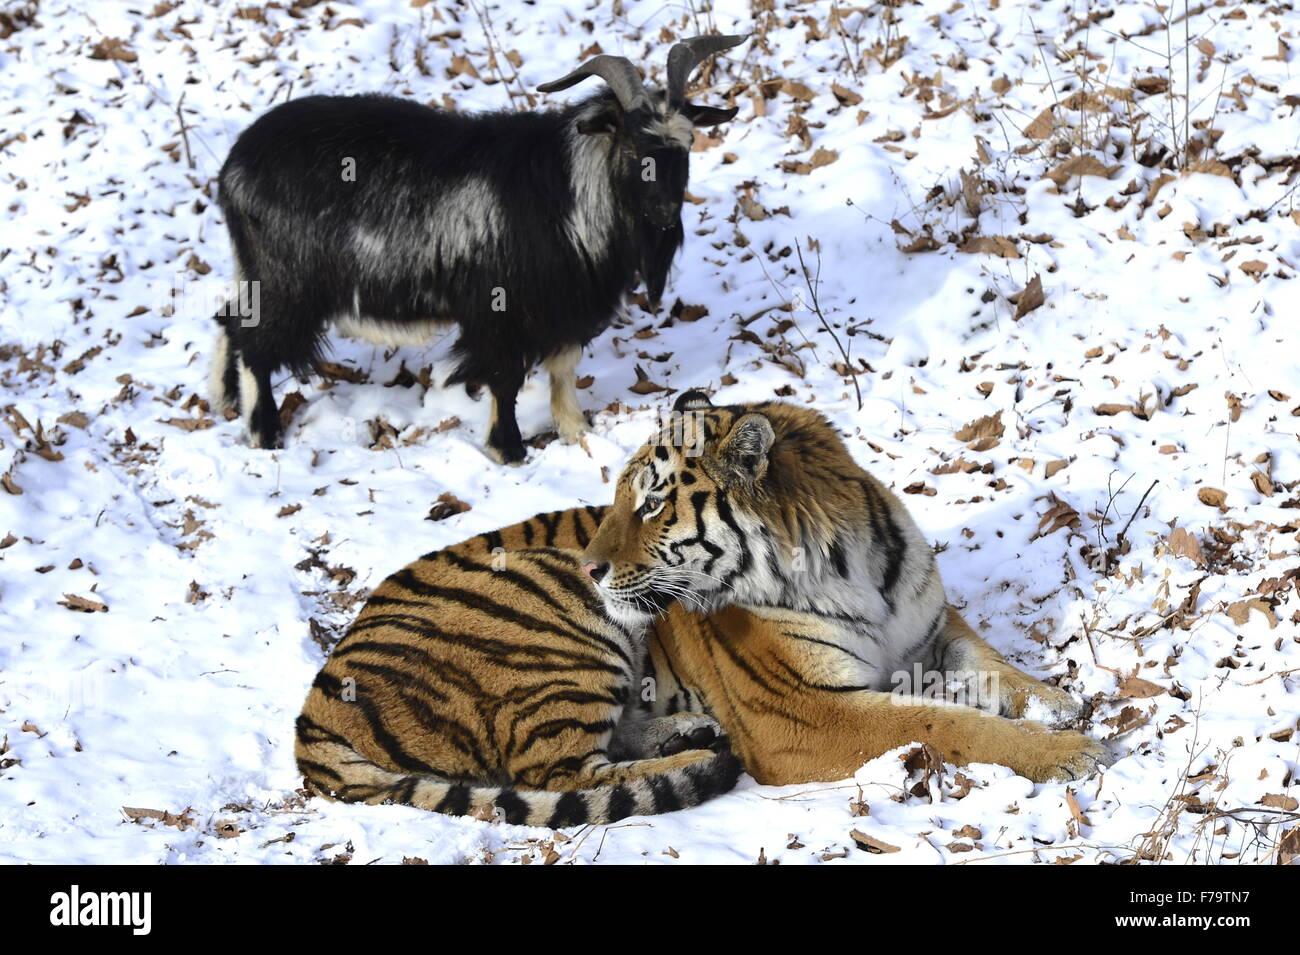 Safari Park in Shkotovo: a corner of unity with nature 9